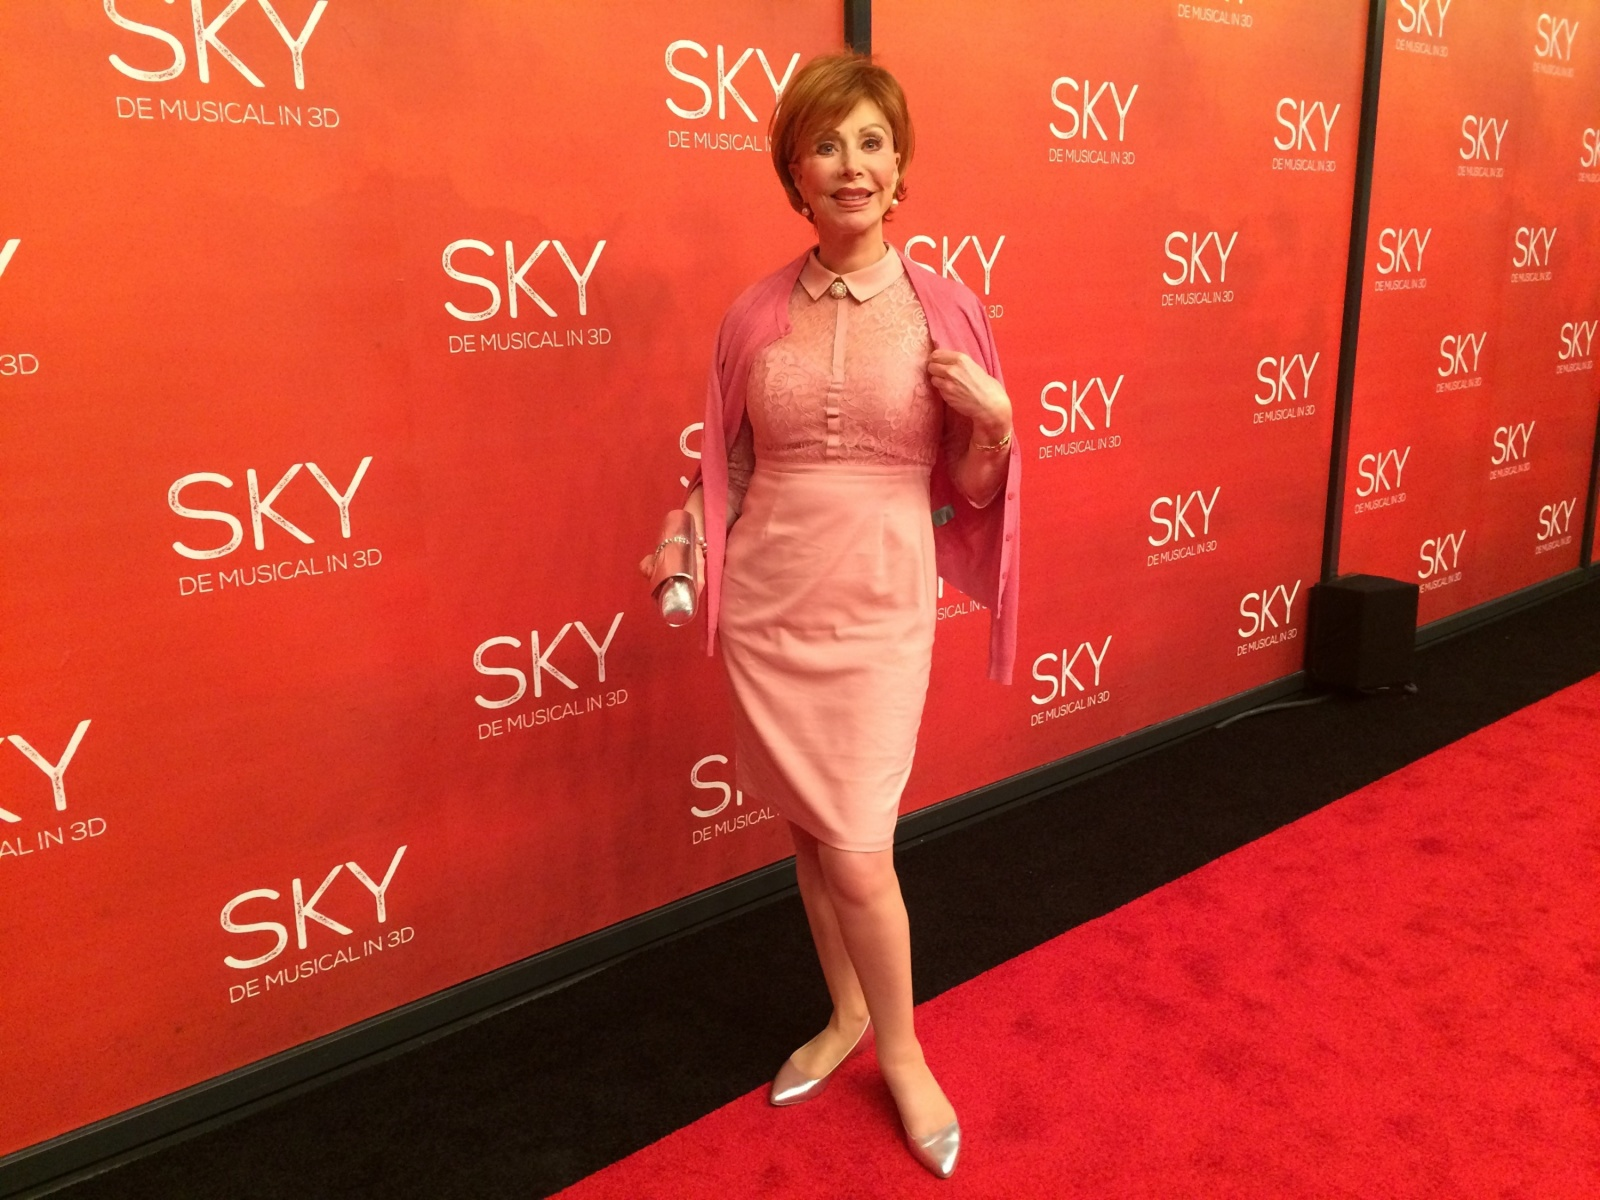 04 04 2016 Marijke Helwegen Premiere SKY the musical